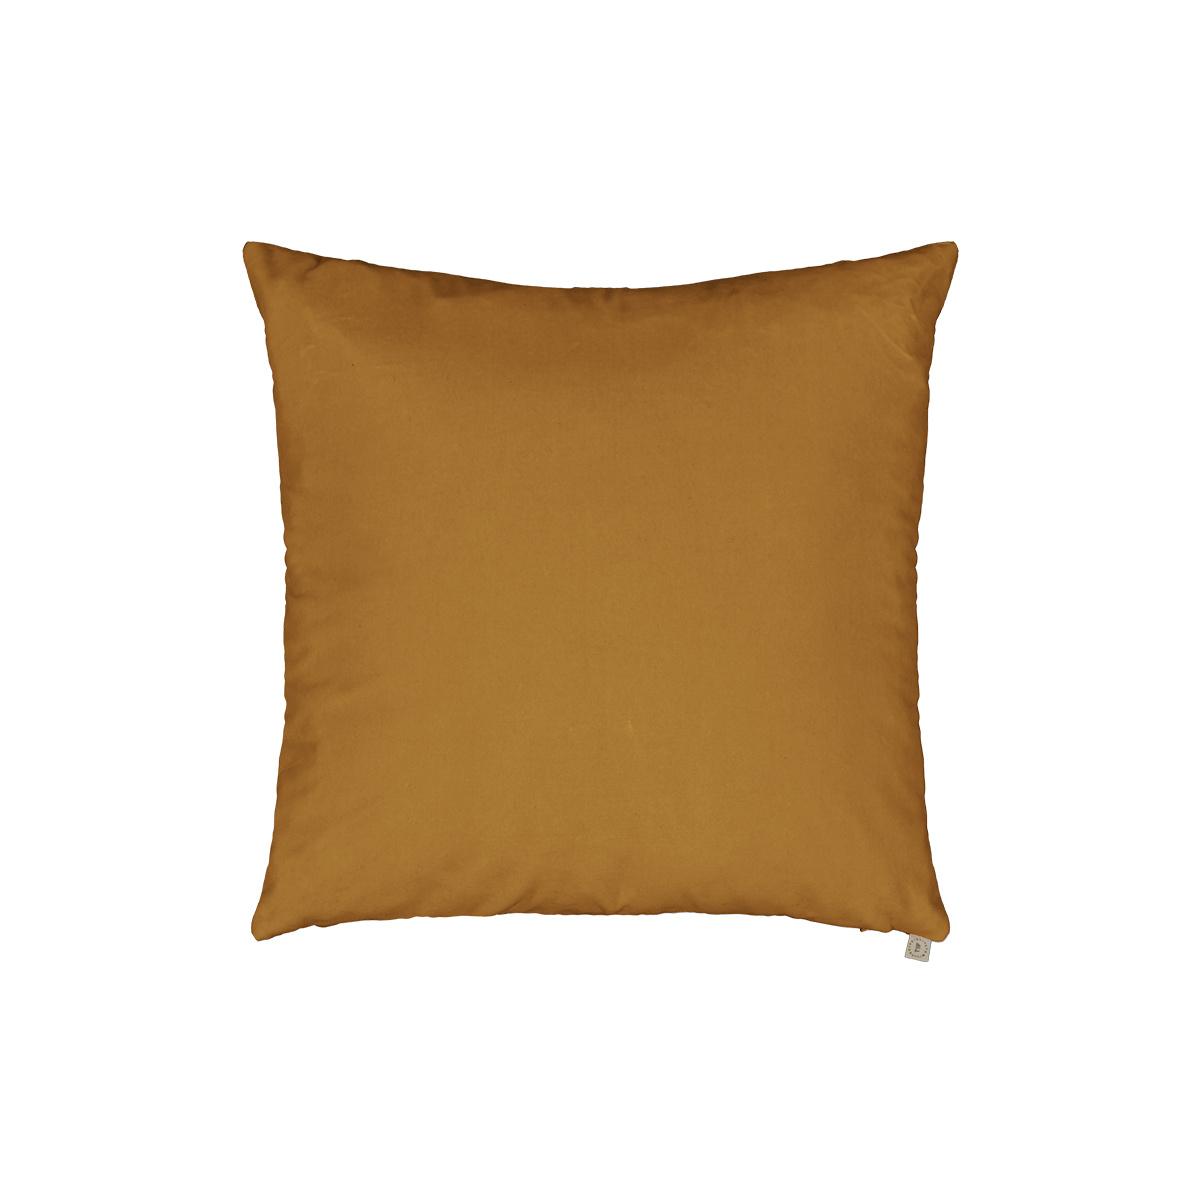 Nonna Cushion Mustard Velvet